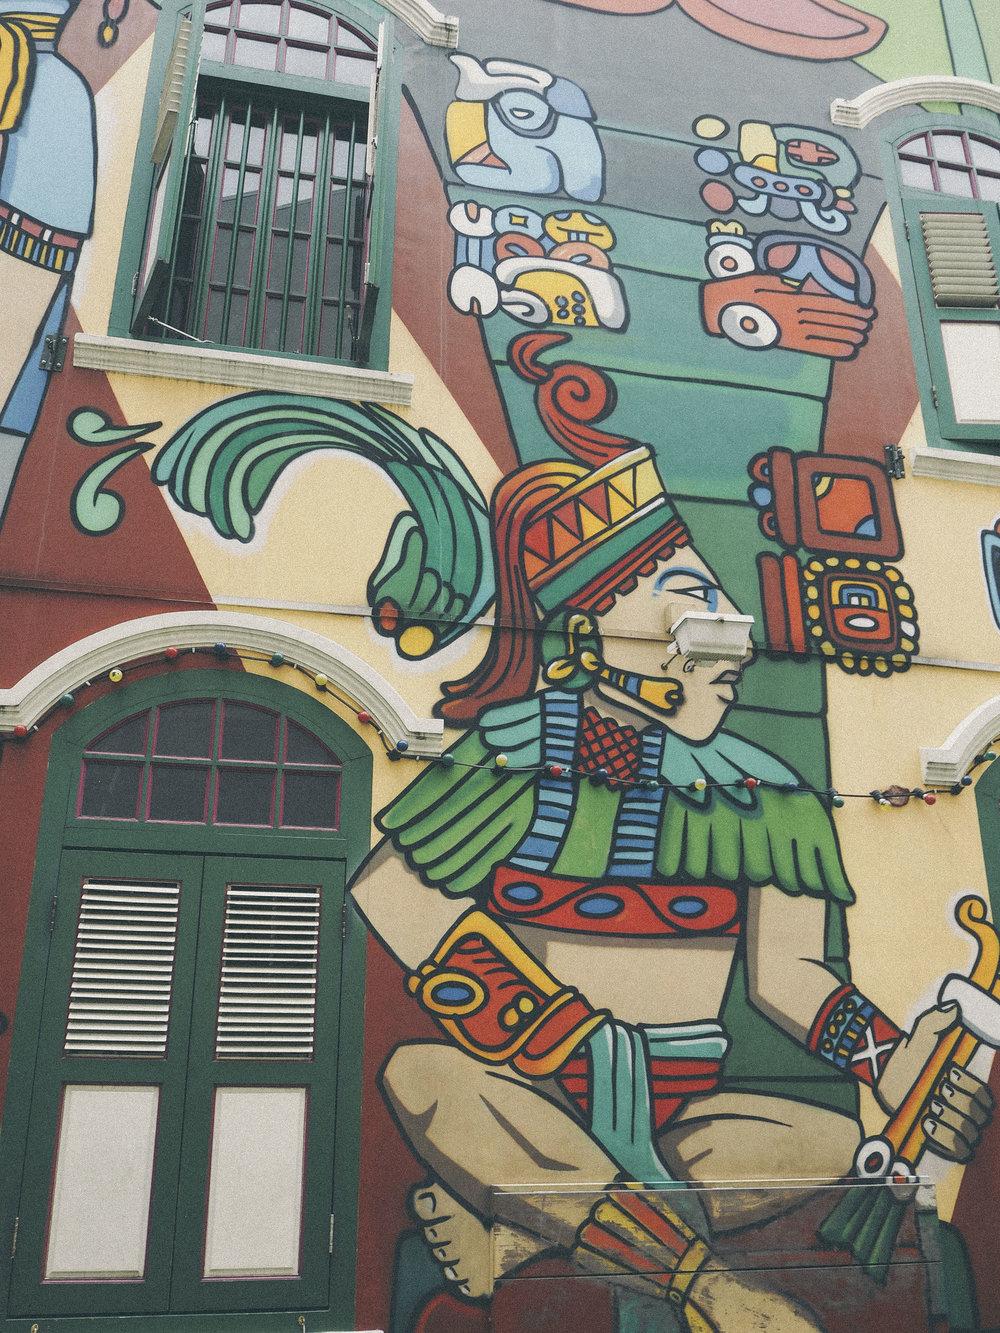 haji lane, singapore - www.derrive.com